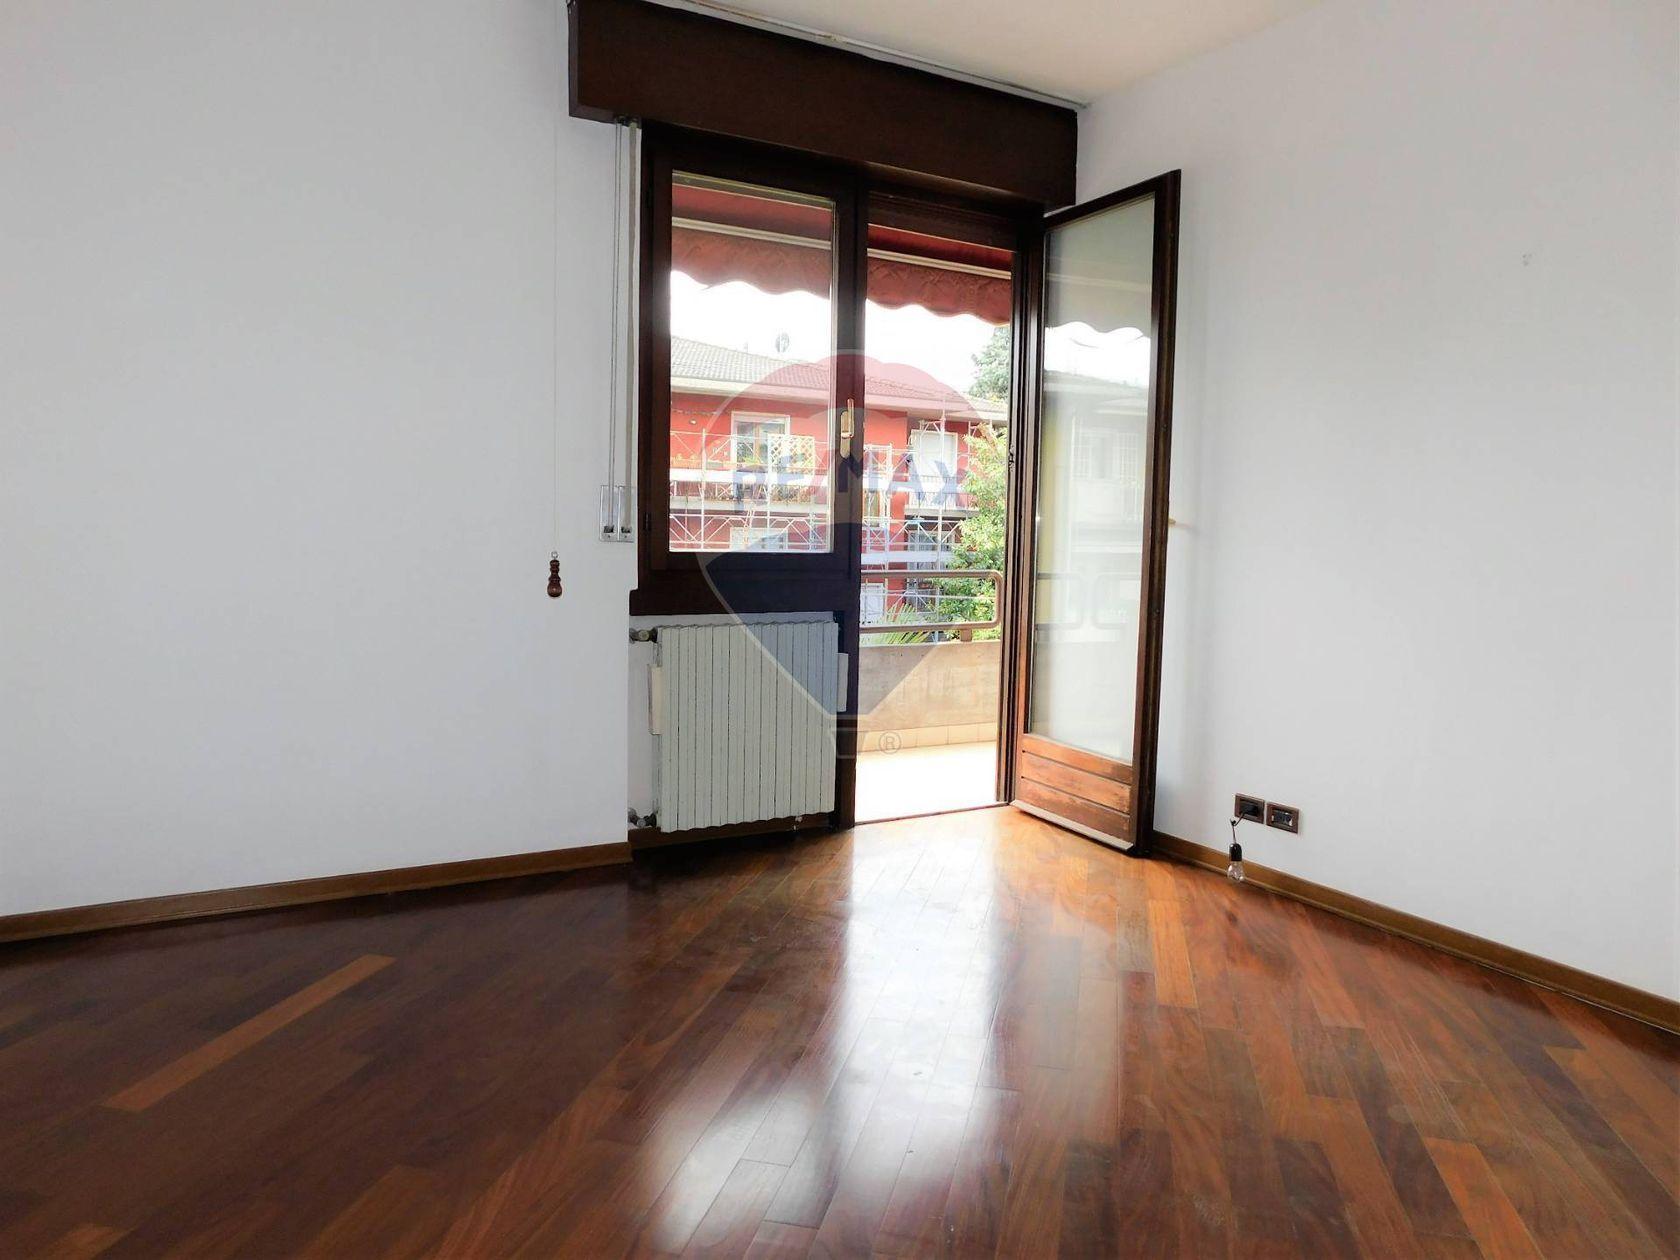 Casa Indipendente Quinzano, Verona, VR Vendita - Foto 18